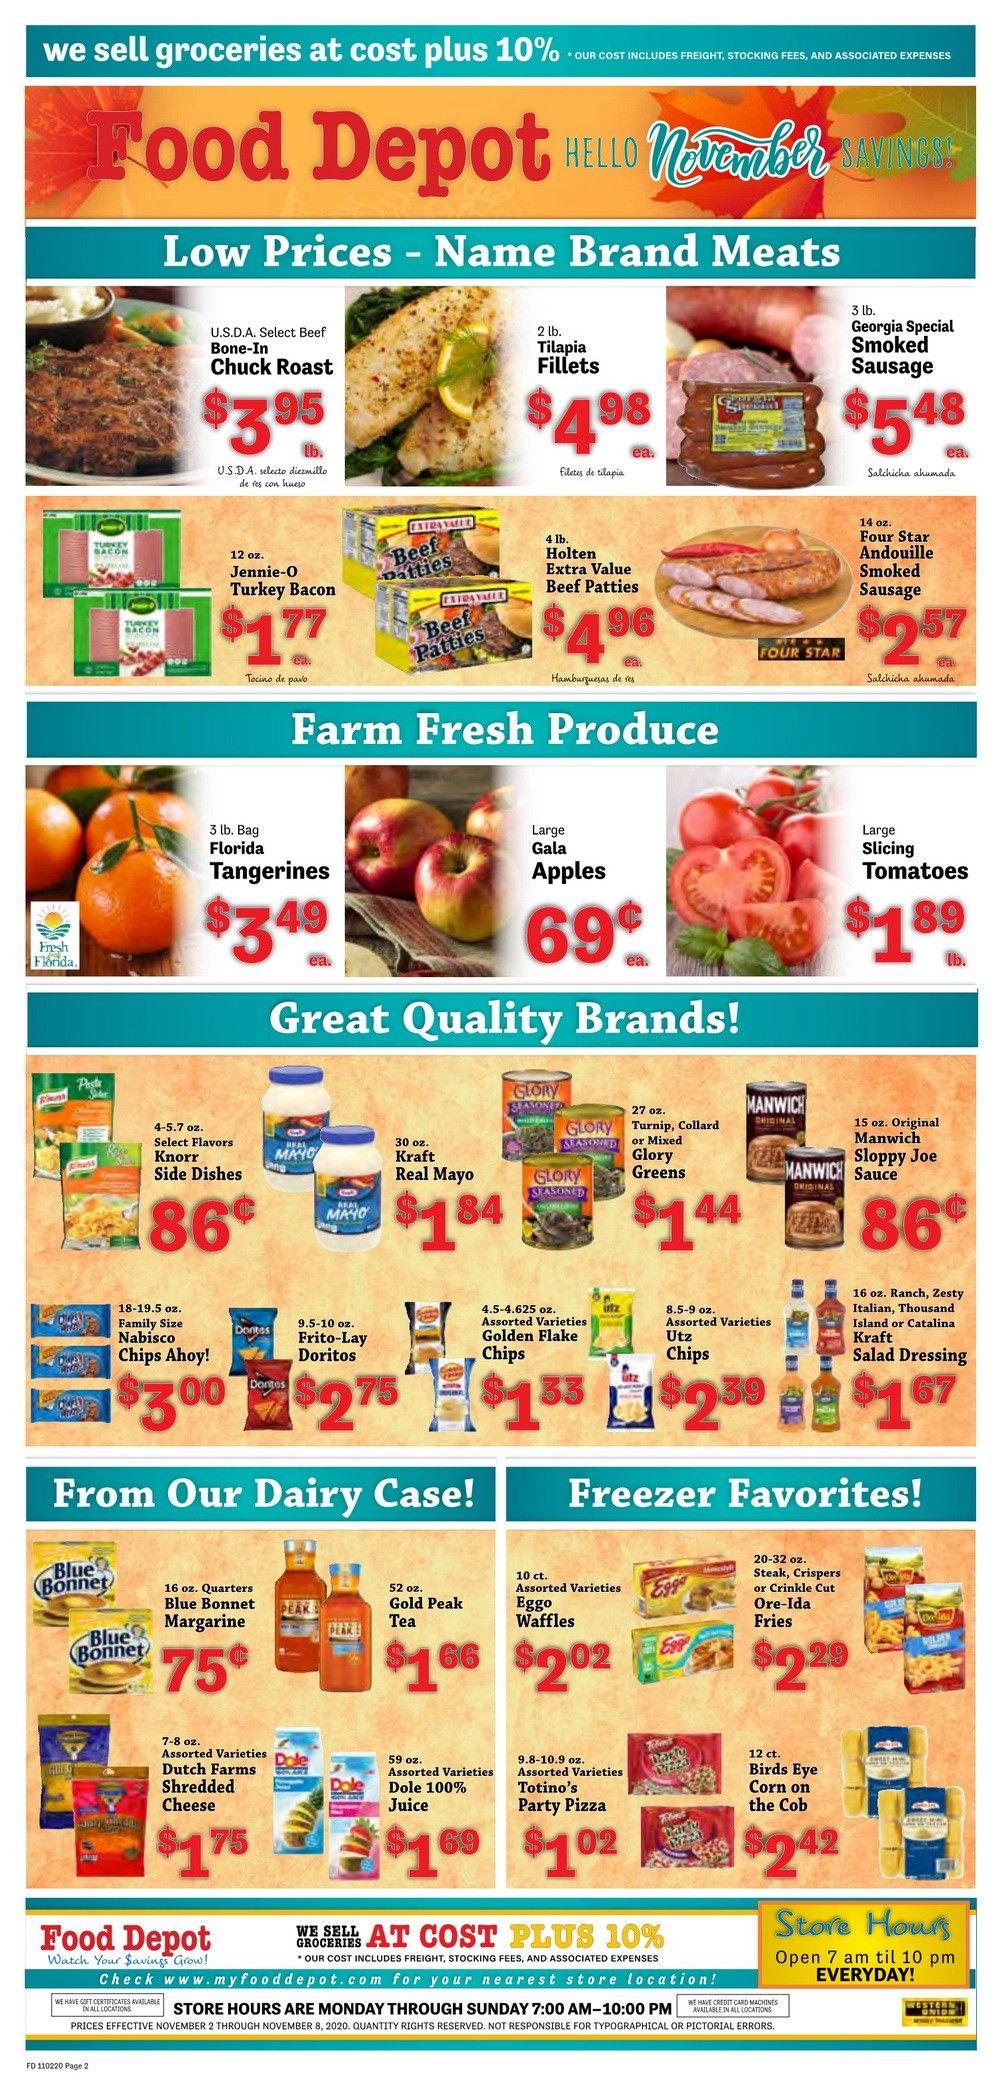 Food Depot Weekly Ad Nov 02 - Nov 08, 2020